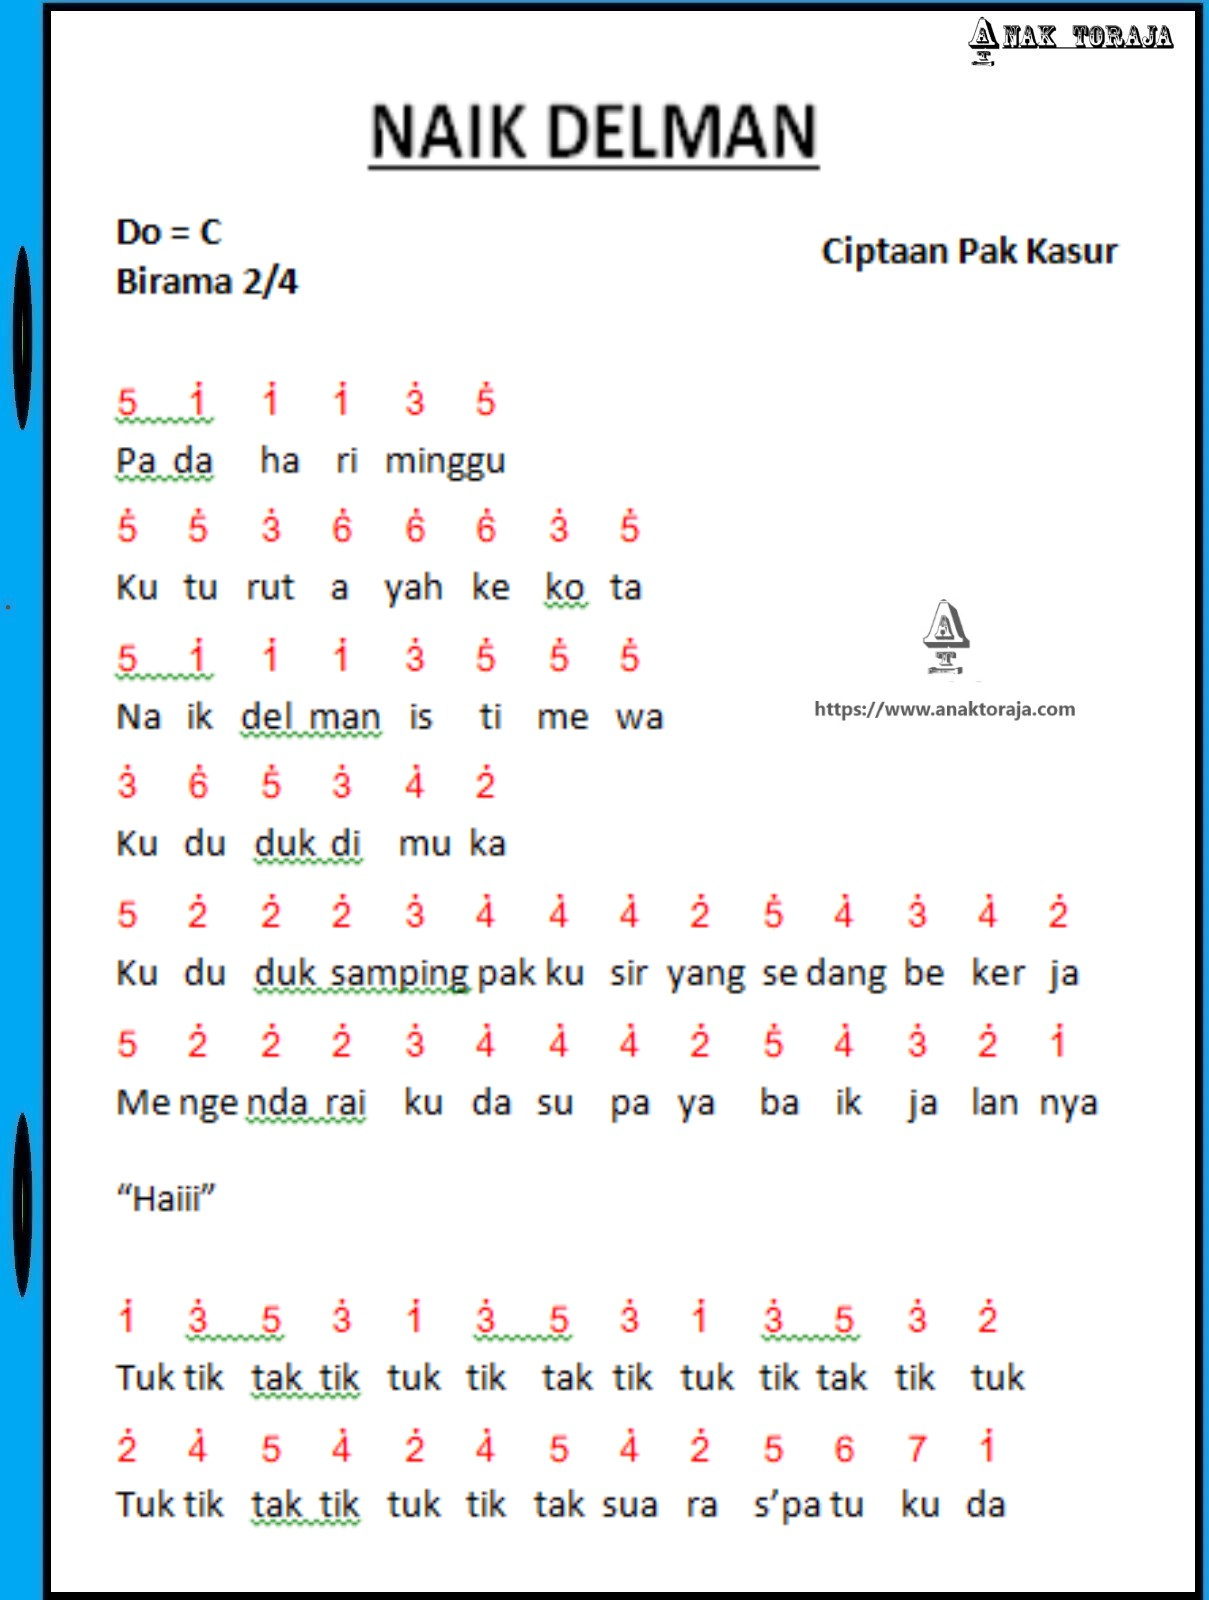 Lagu Anak Anak Naik Delman : delman, Angka, Delman